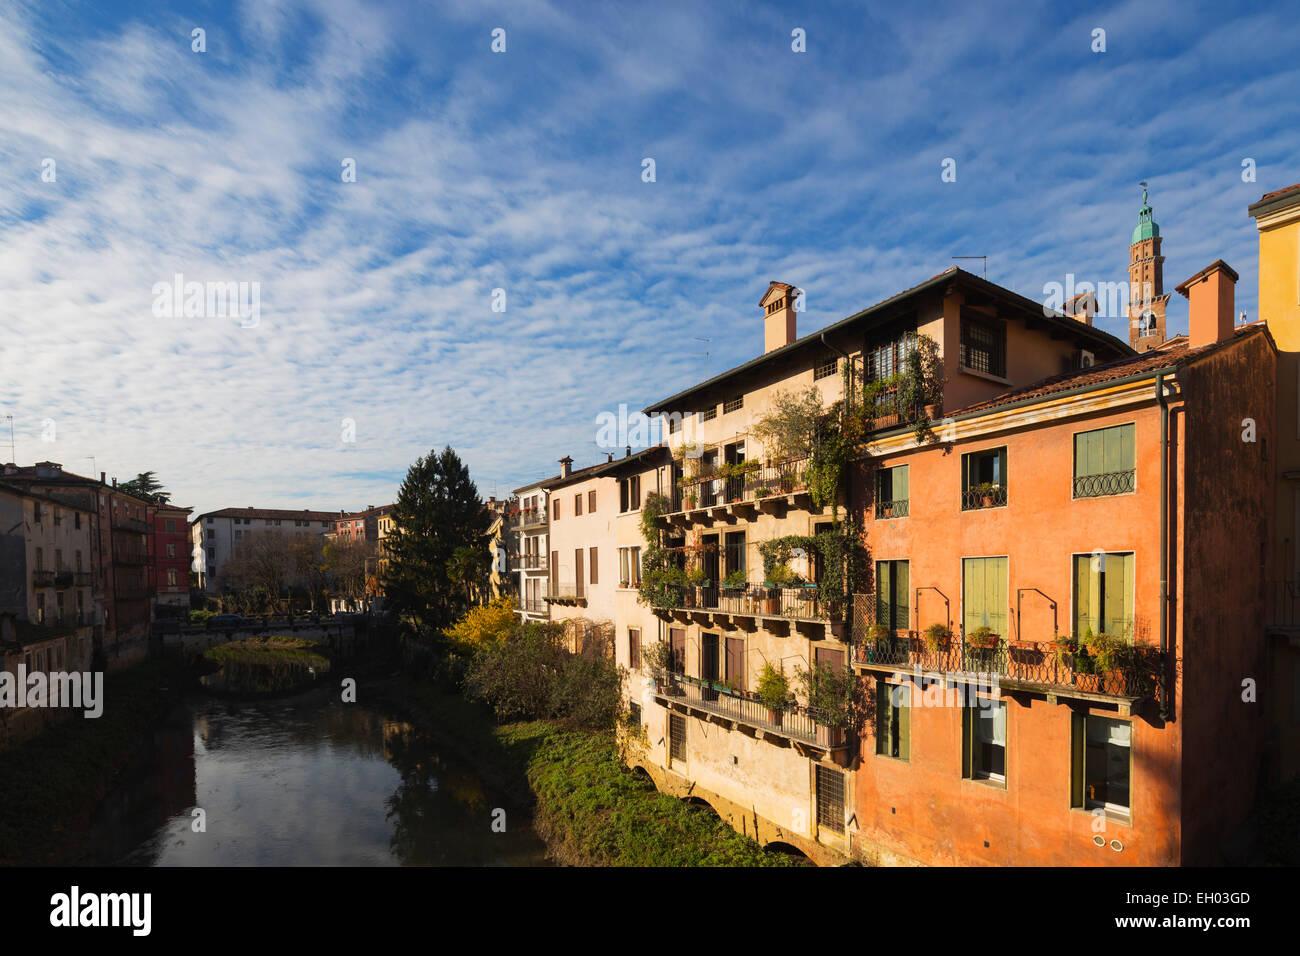 Europe, Italy, Veneto, Vicenza, Unesco World Heritage Site - Stock Image